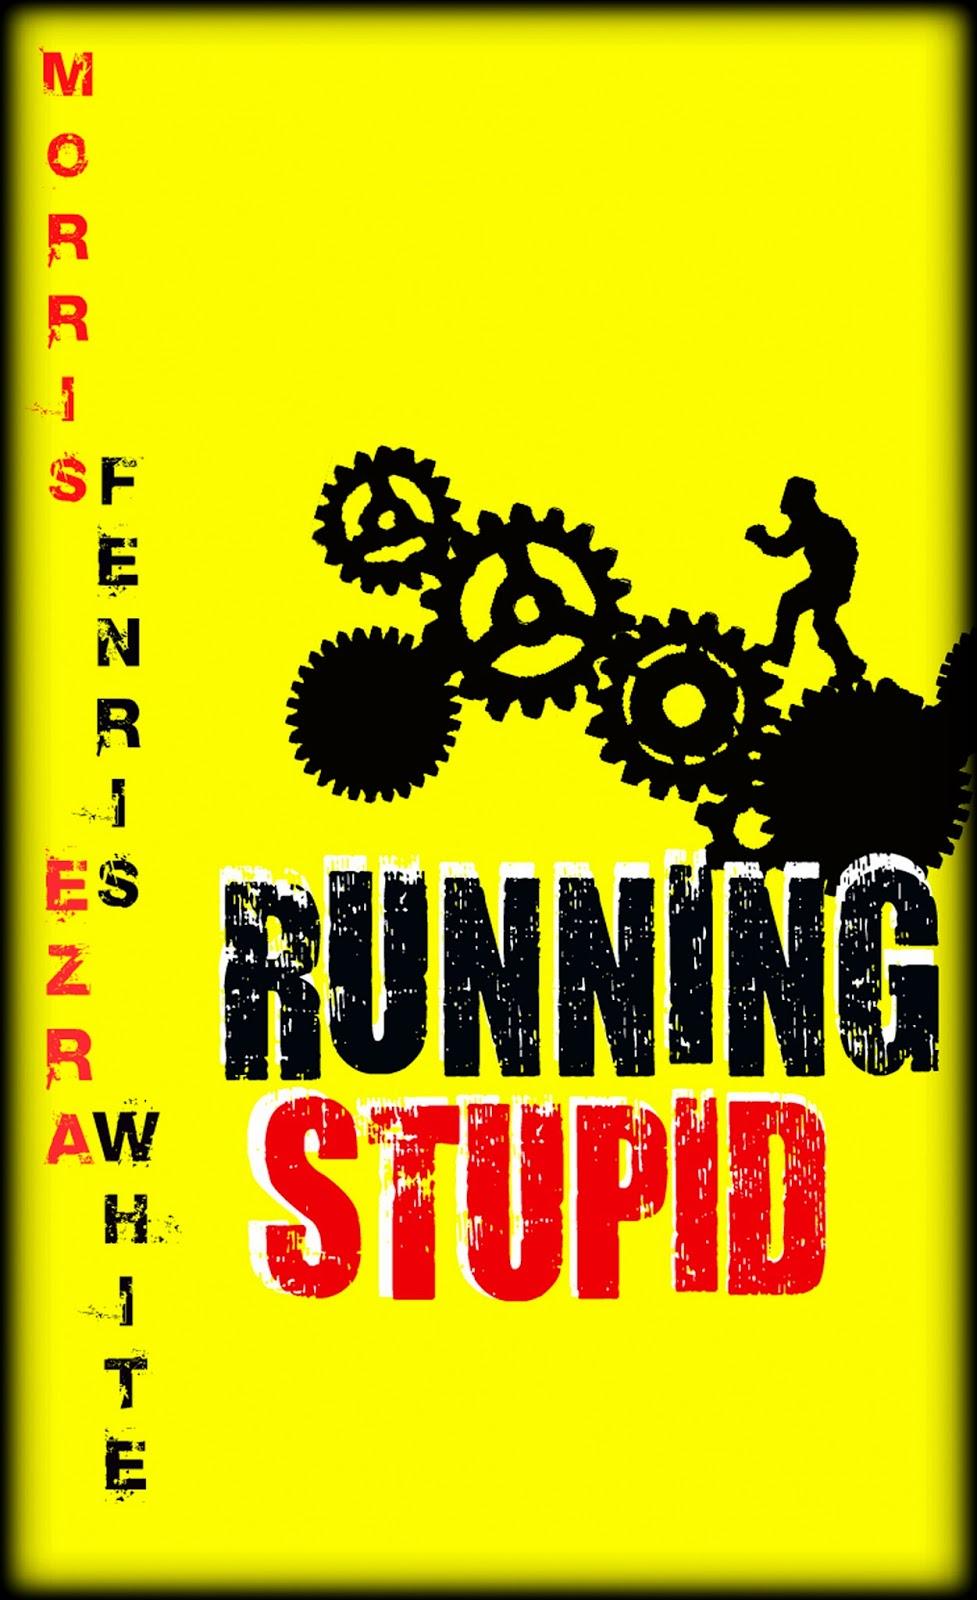 http://www.amazon.com/Mystery-Thriller-Suspense-Punishment-kidnapping-ebook/dp/B00FTIZJKE